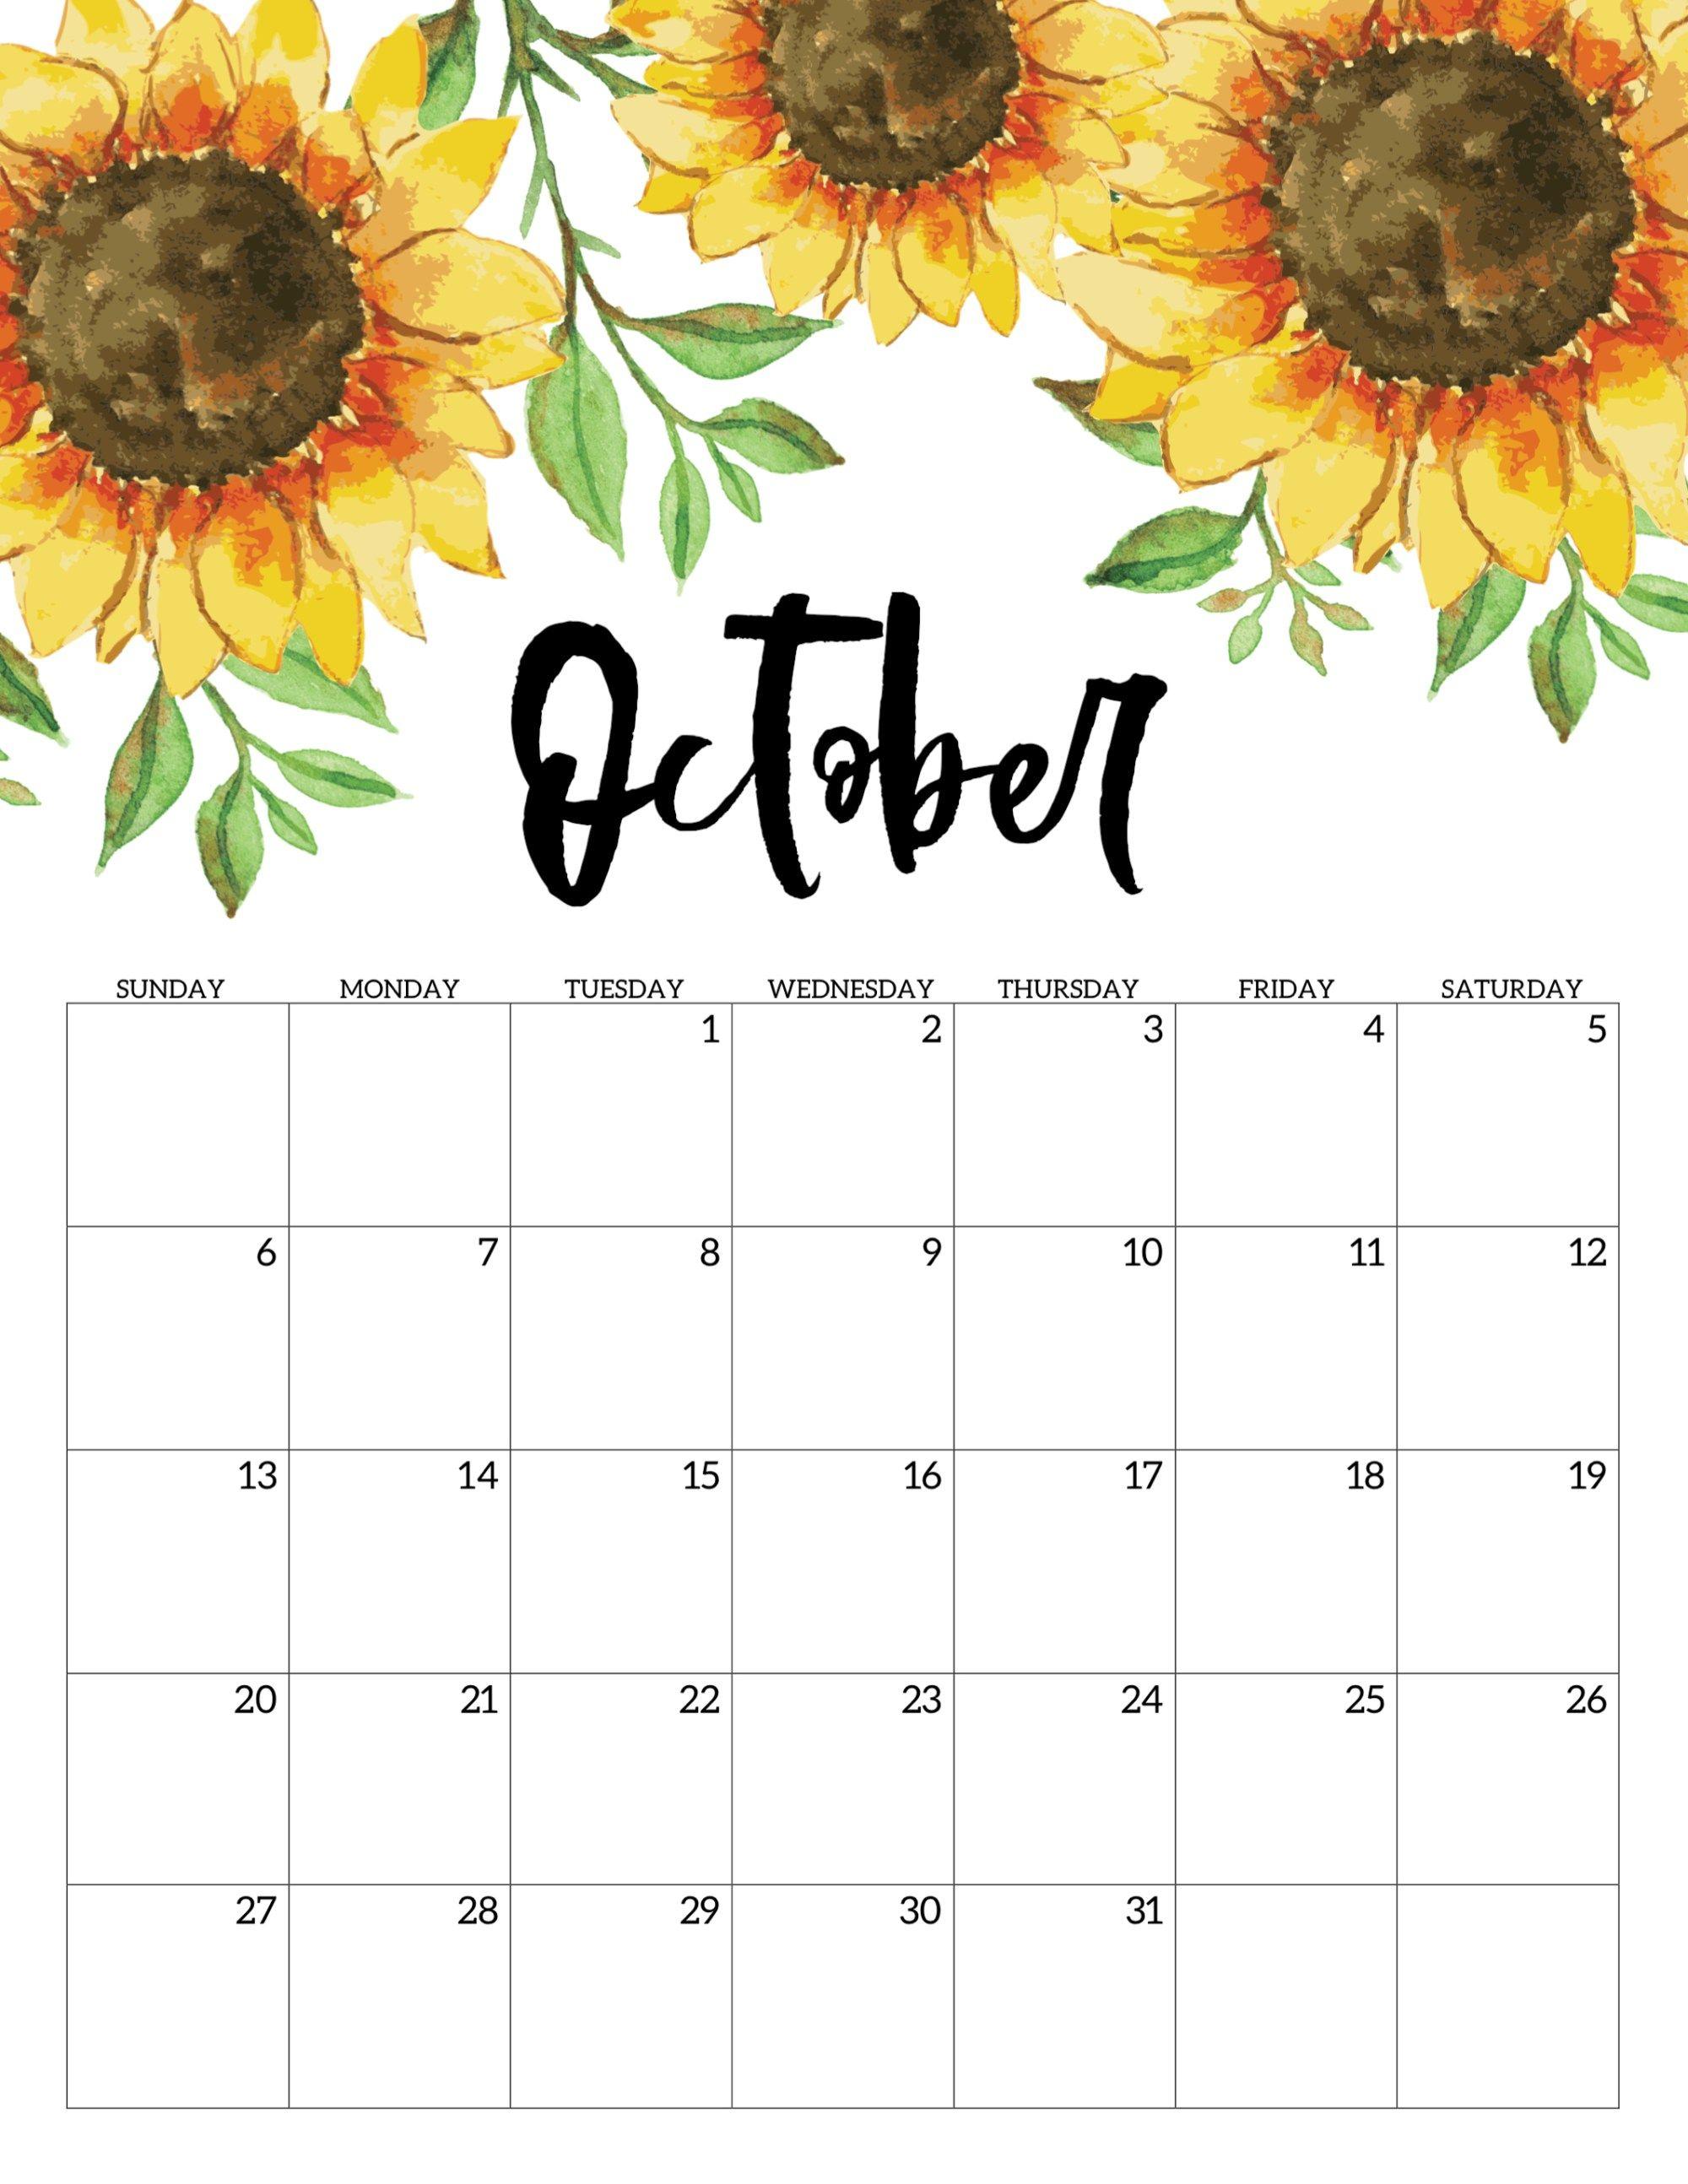 Free Printable Calendar 2019 - Floral | October Calendar